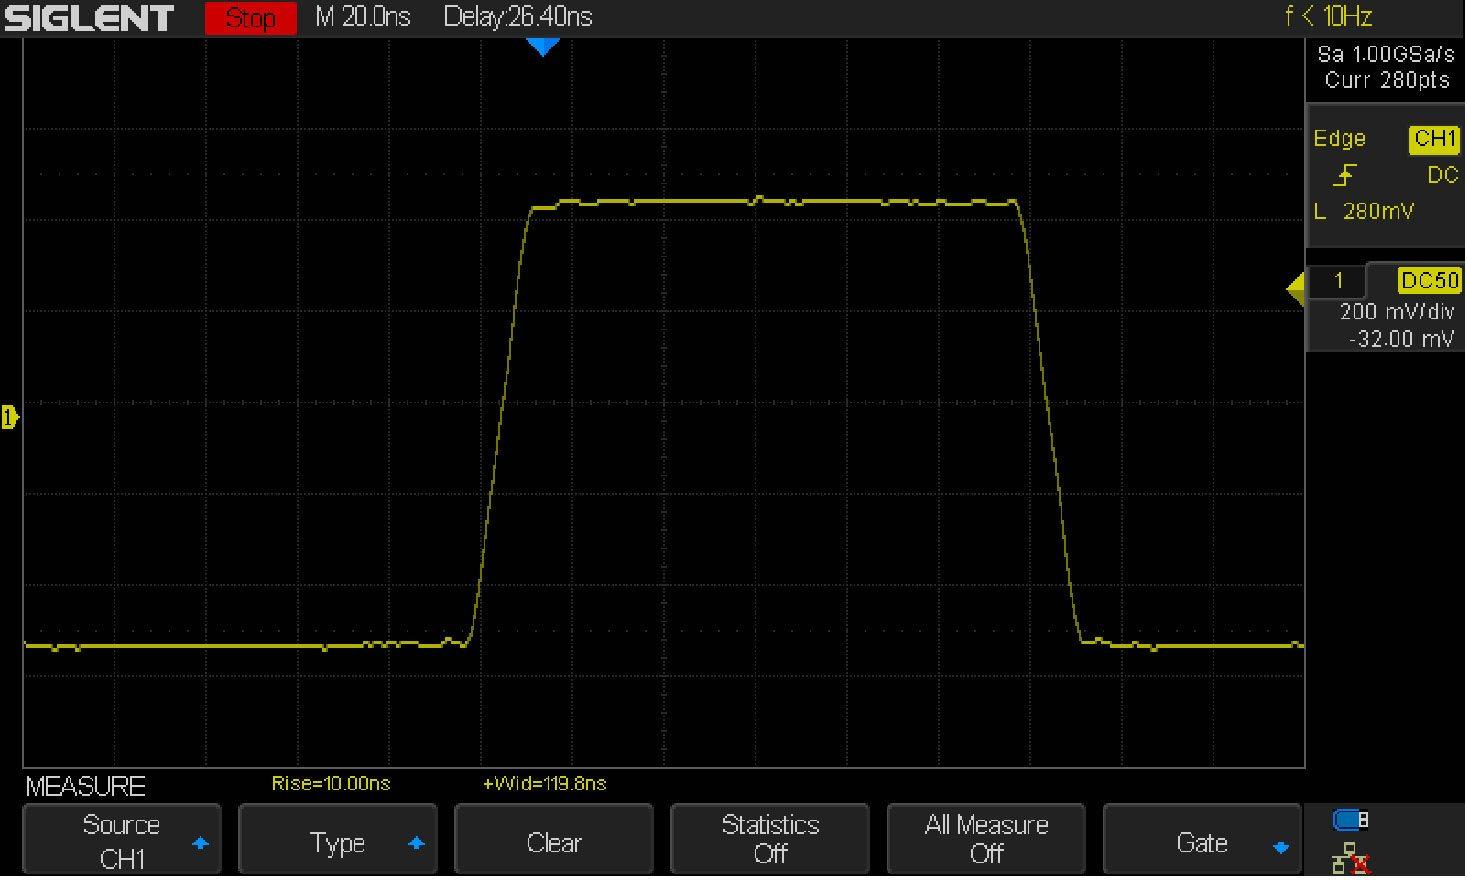 Figure 3: Waveform characteristics of one single pulse